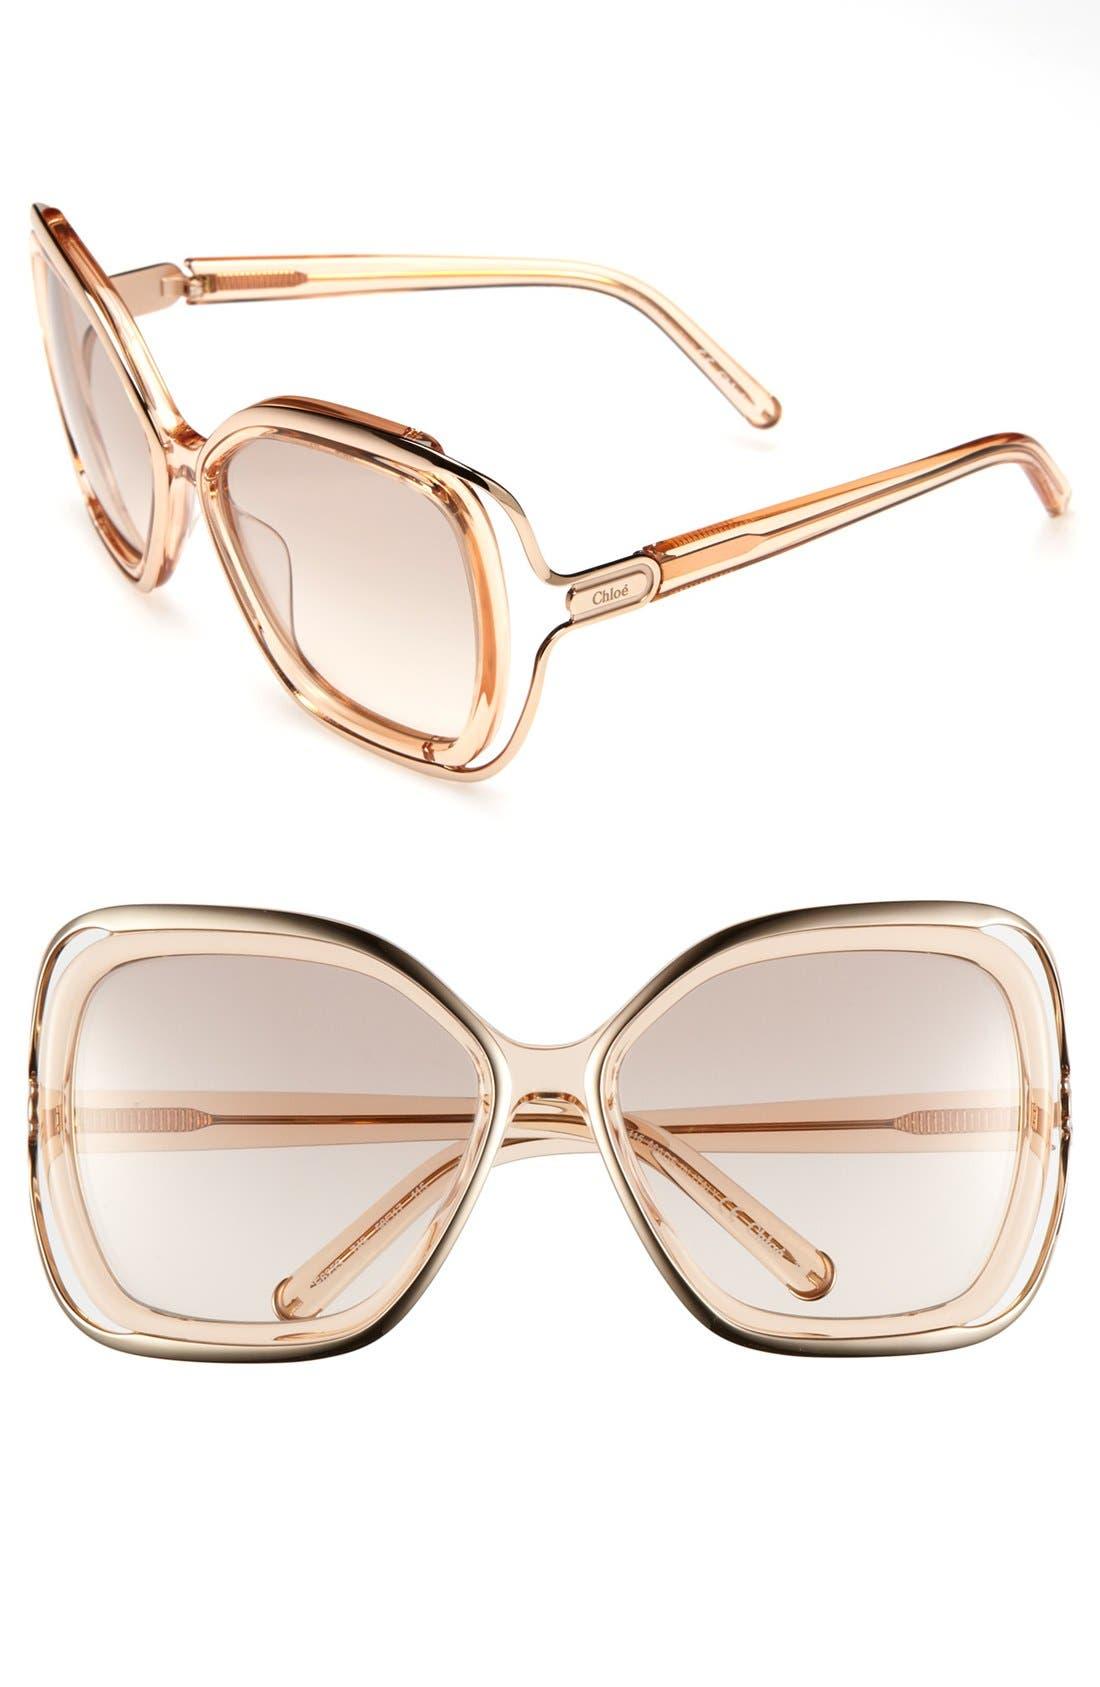 Main Image - Chloé 56mm Sunglasses